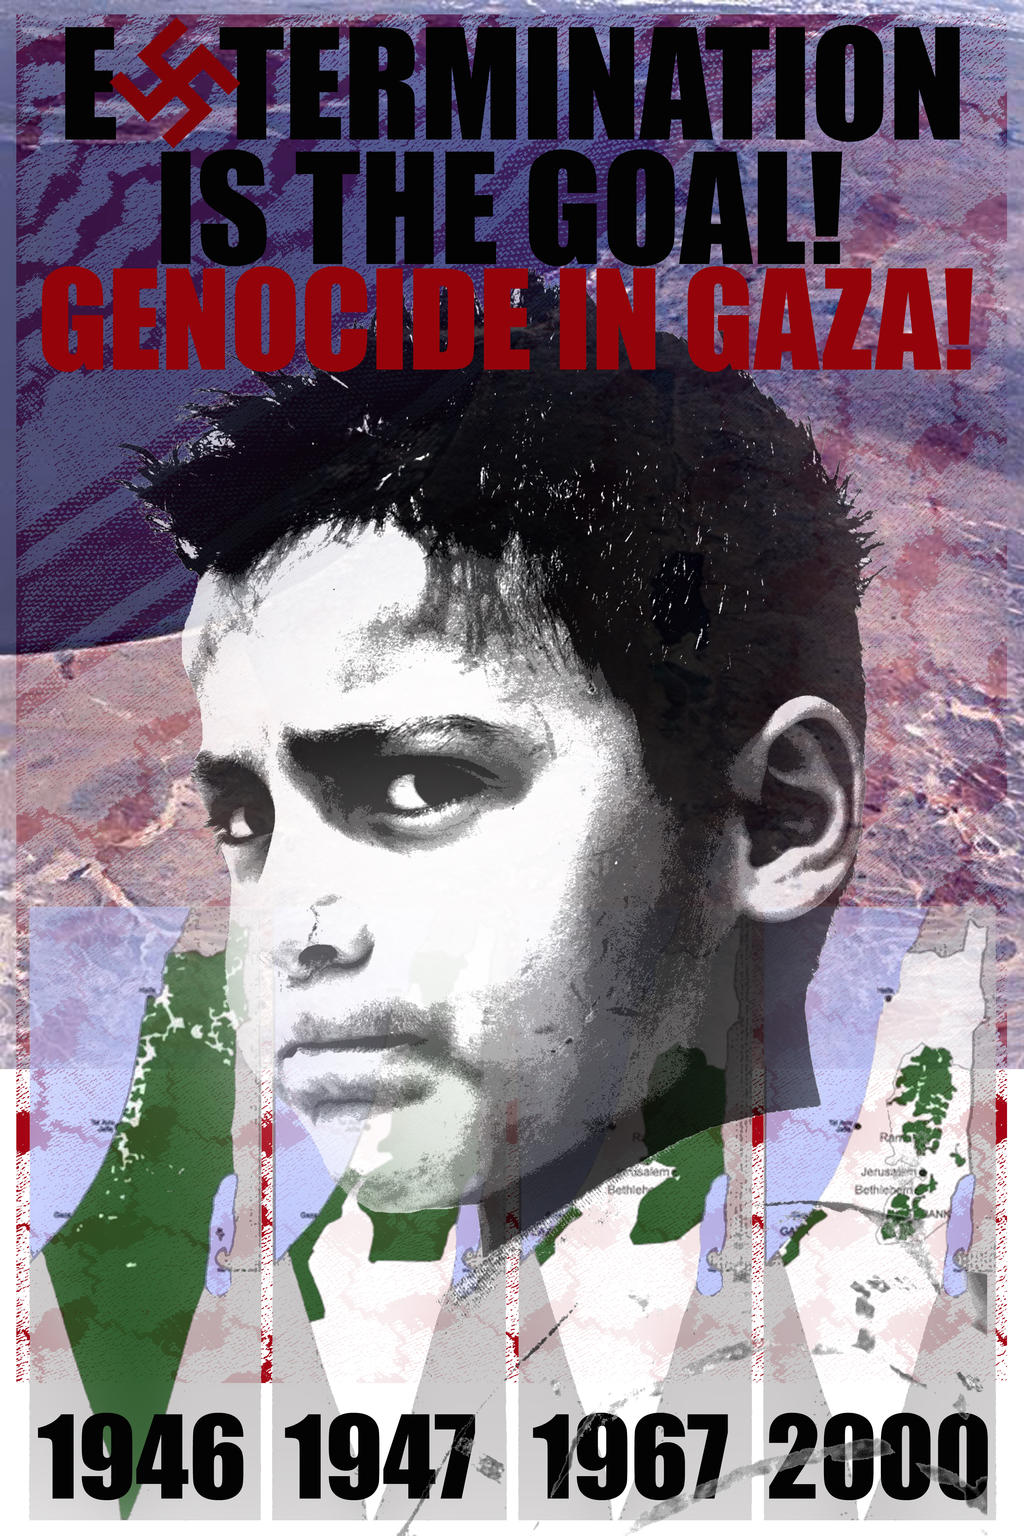 genocide in Gaza copy by jbeverlygreene